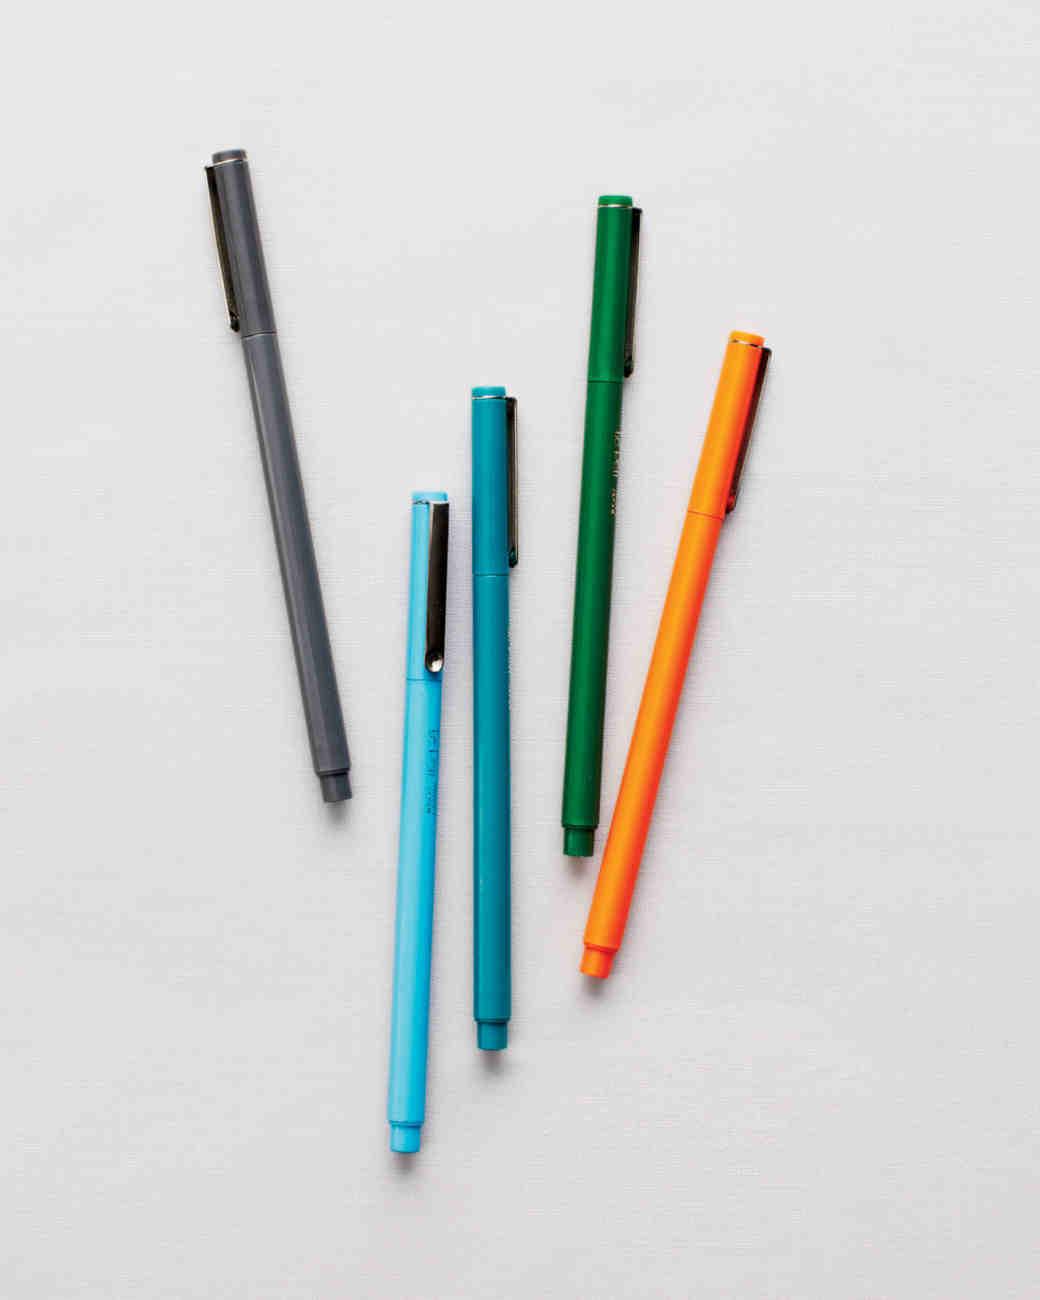 paper-pens-gt-mwd107748.jpg